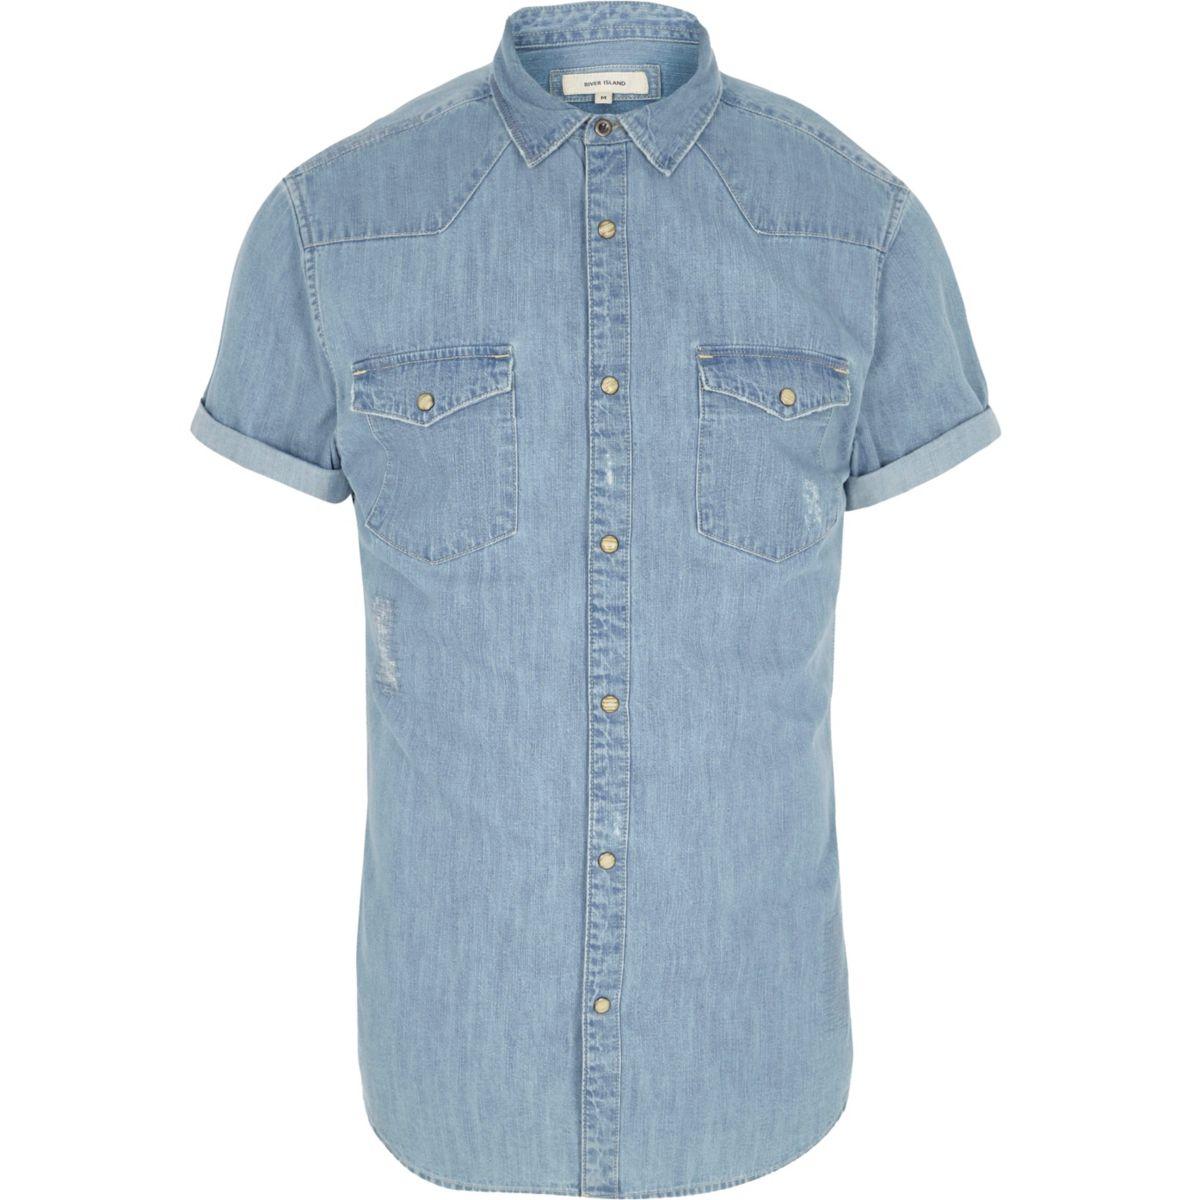 Blue denim short sleeve western shirt